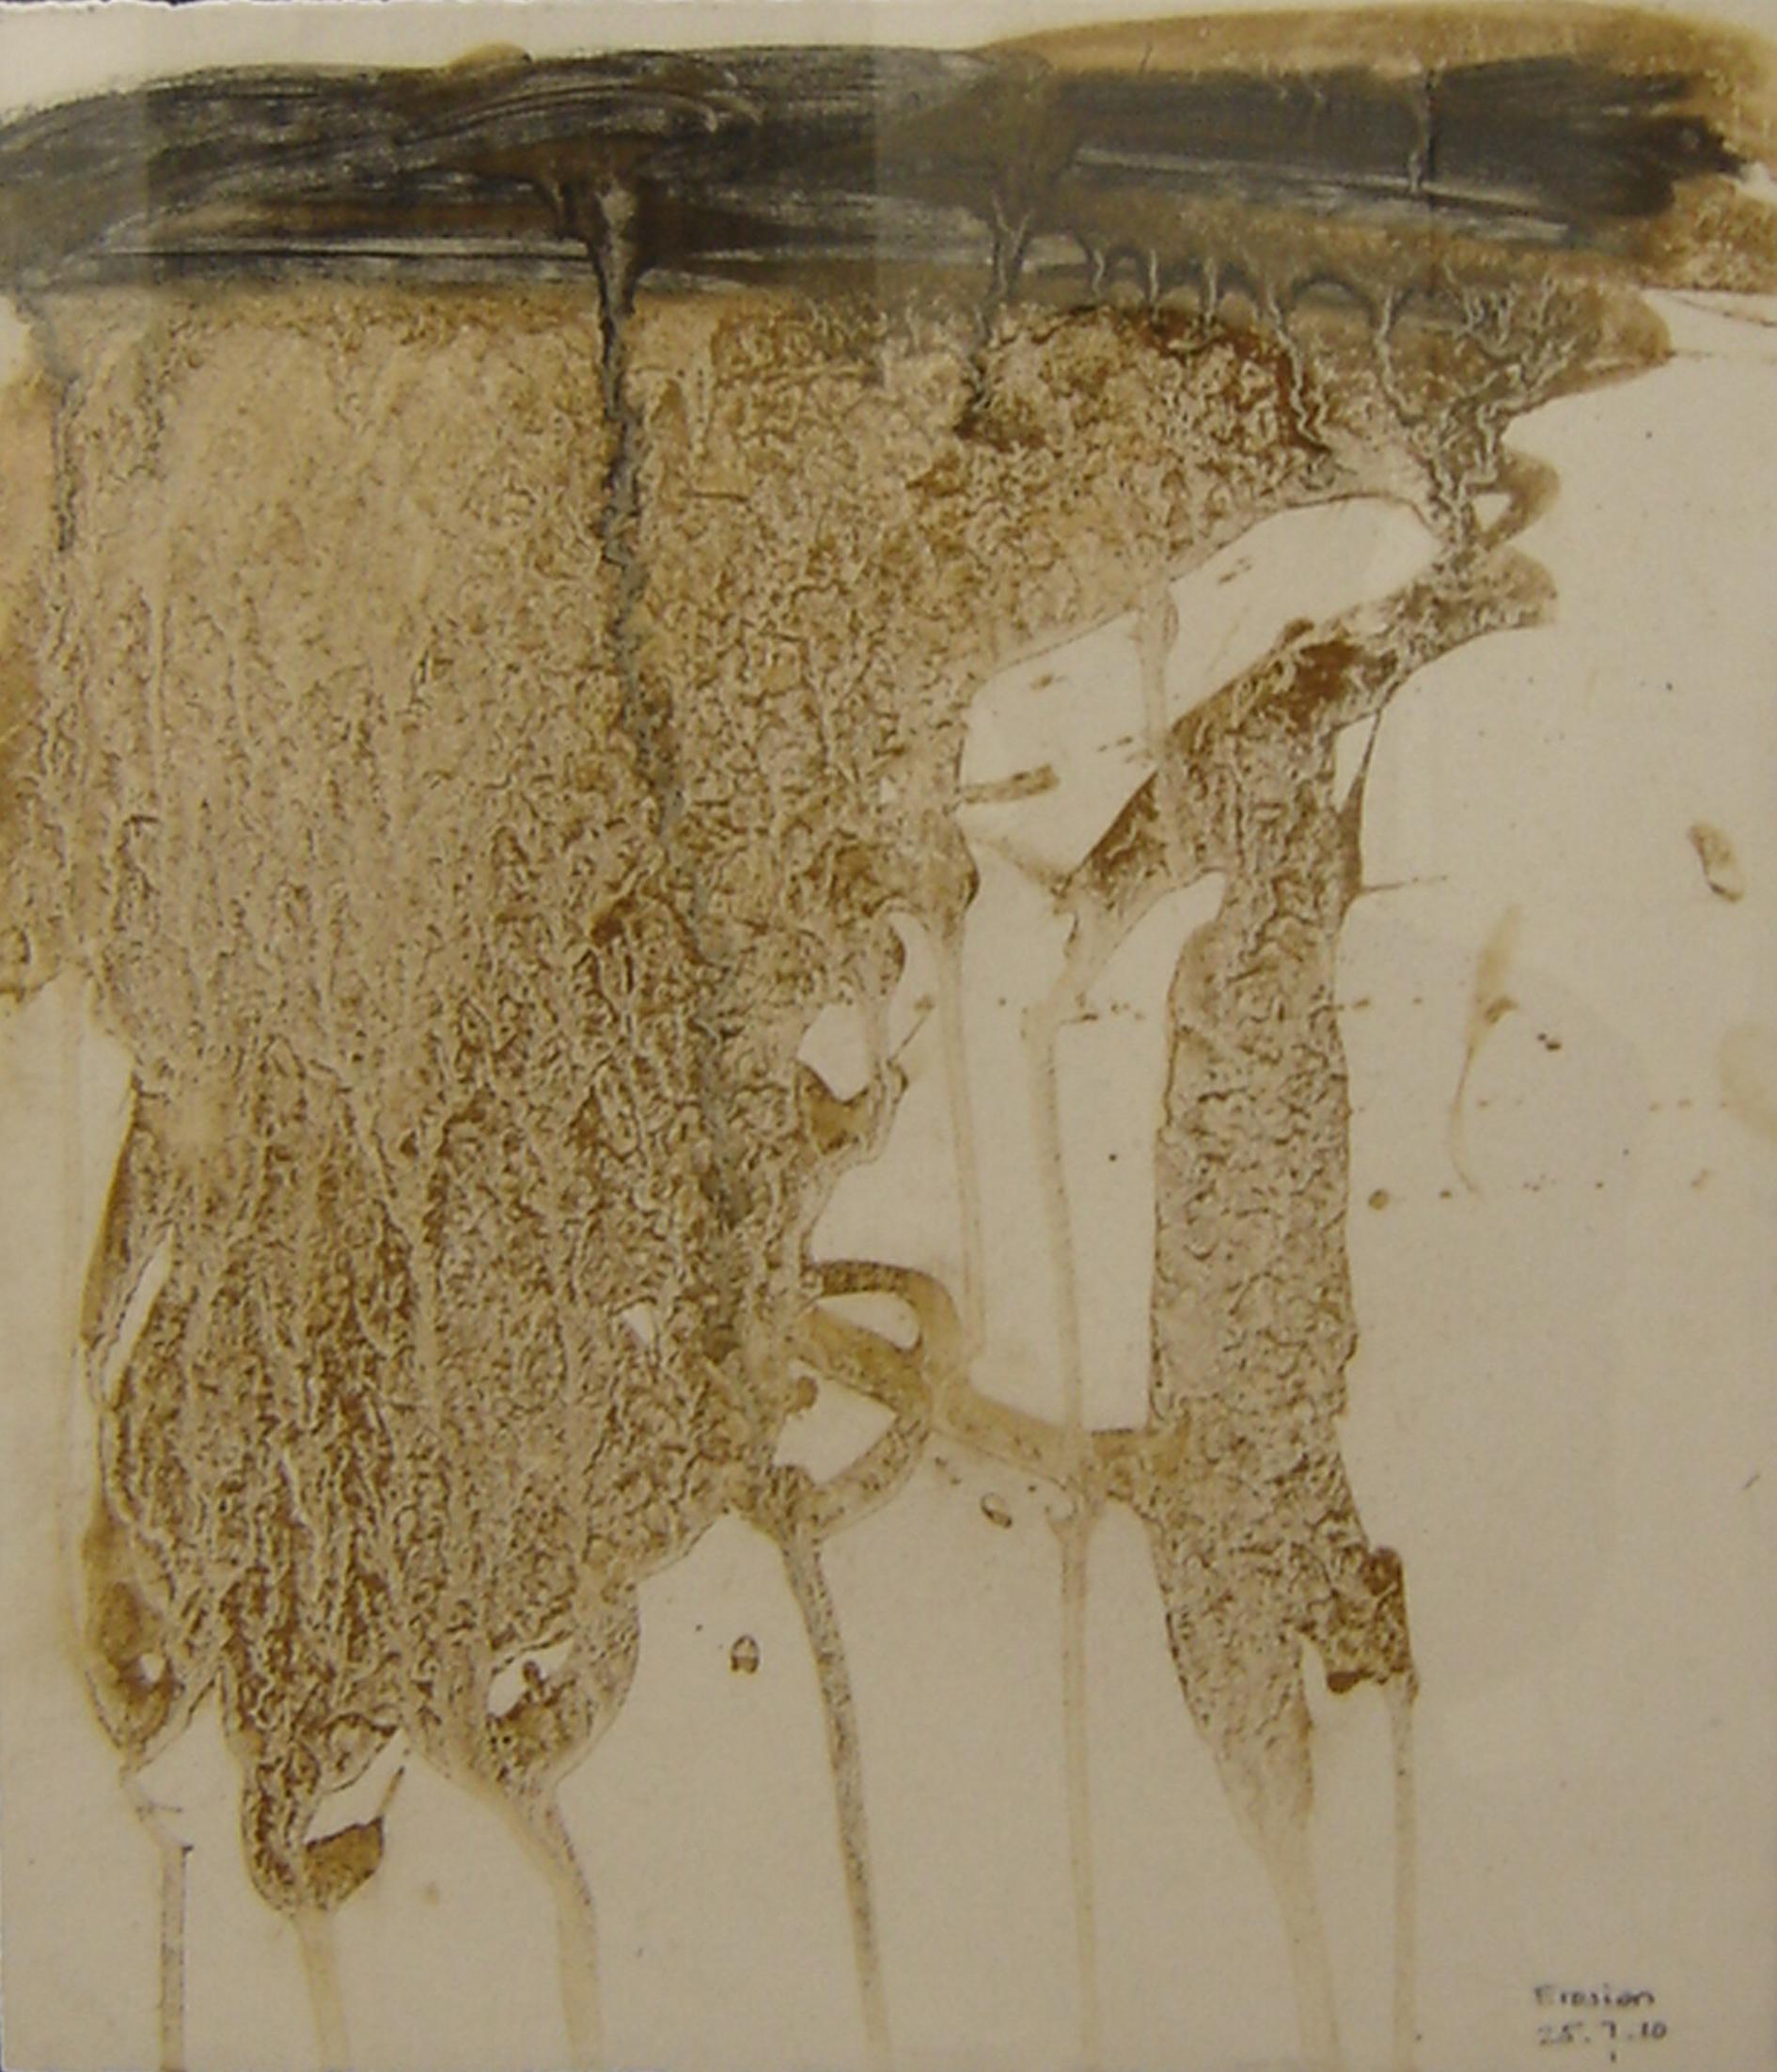 Erosion 2 Mud on gessoed paper 41 x 35 cm 2009